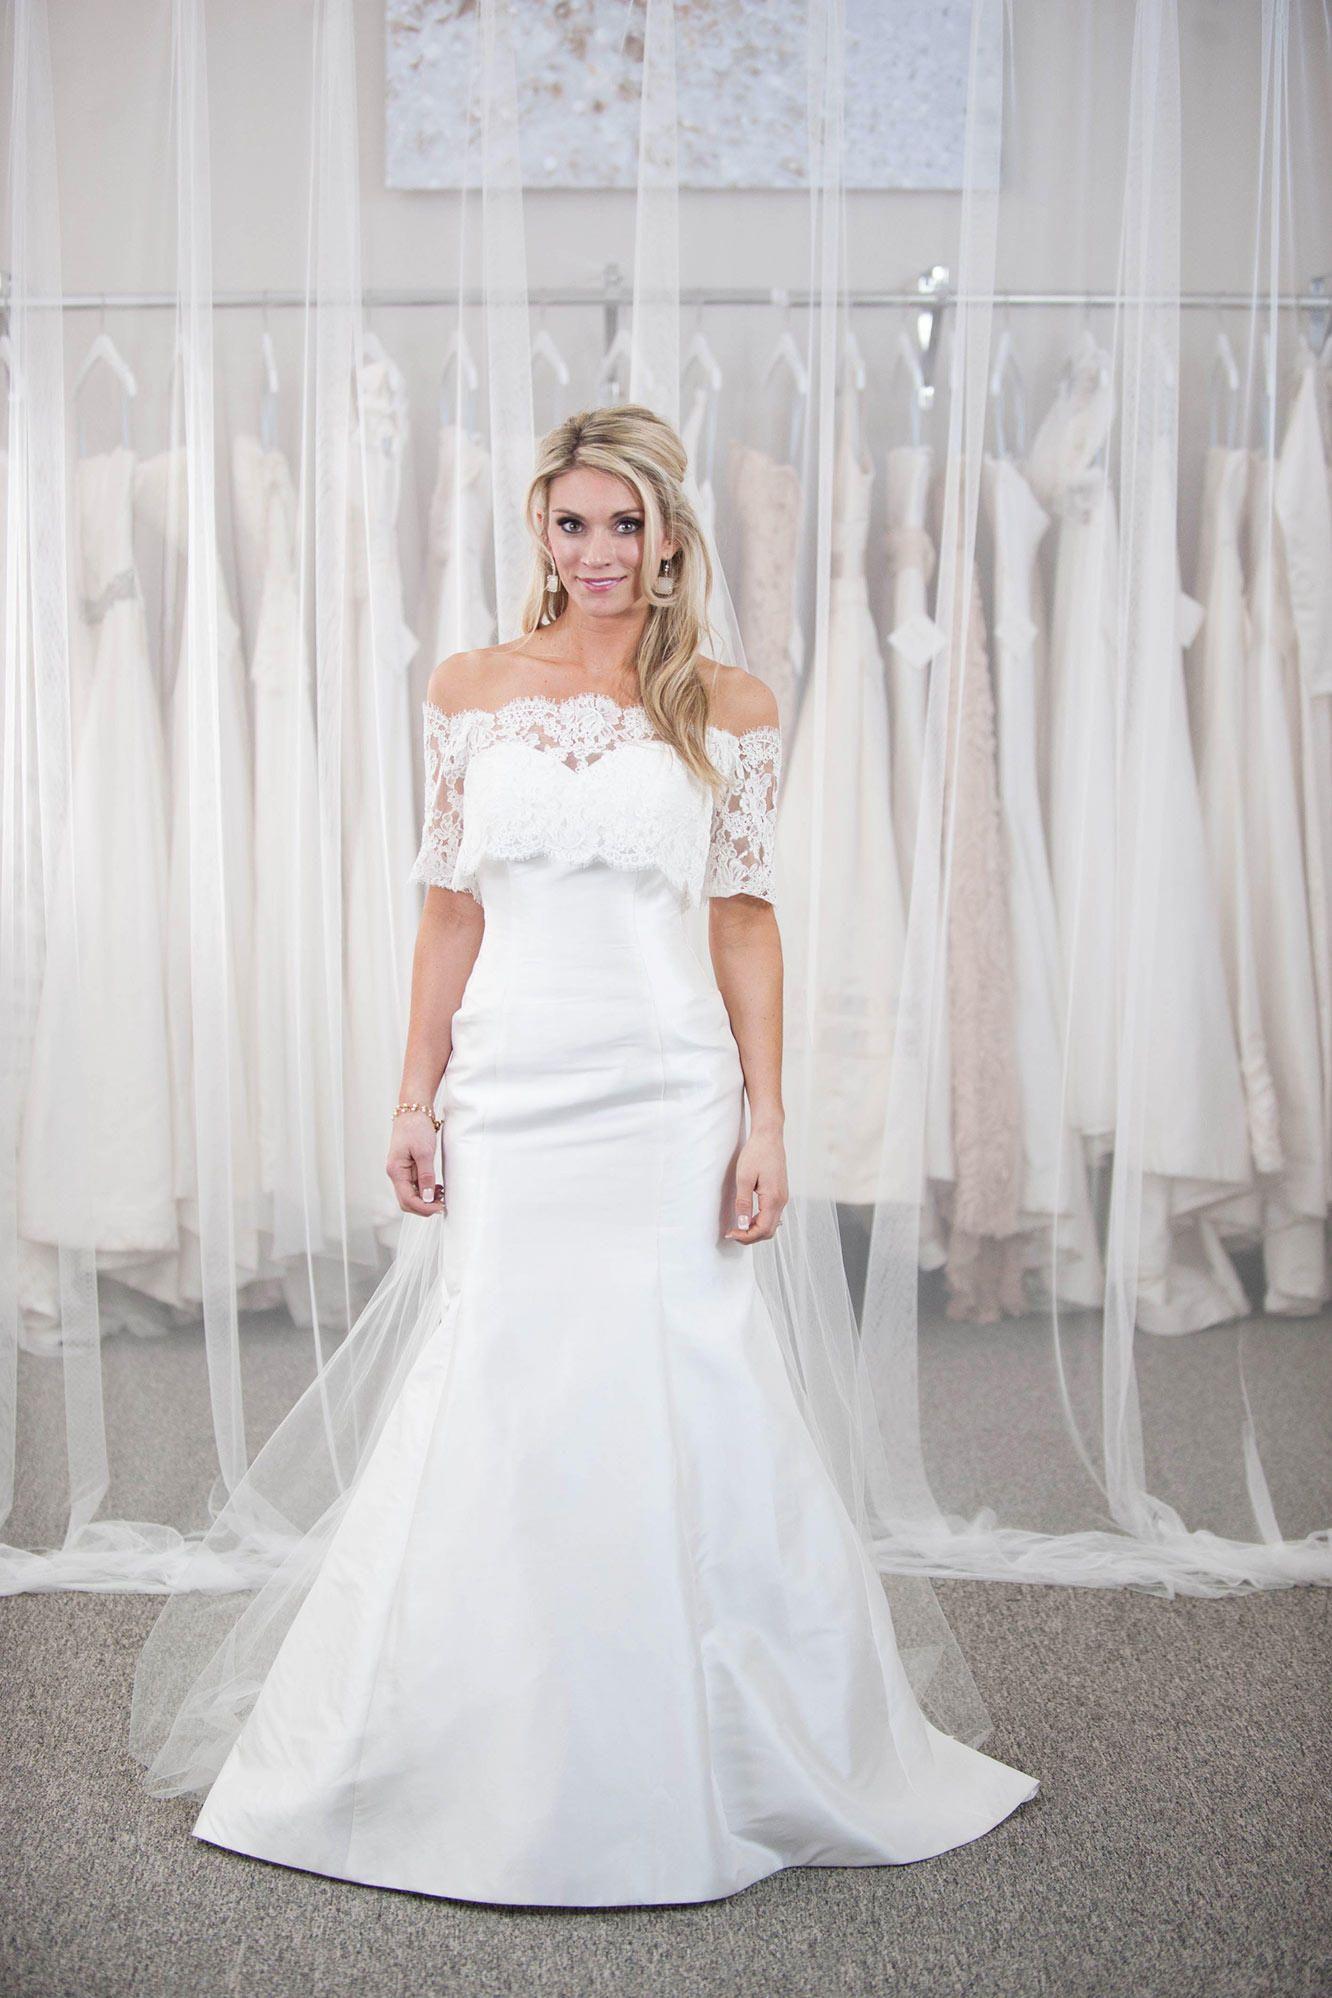 Bride By Design | wedding | Pinterest | Watch full episodes, Full ...